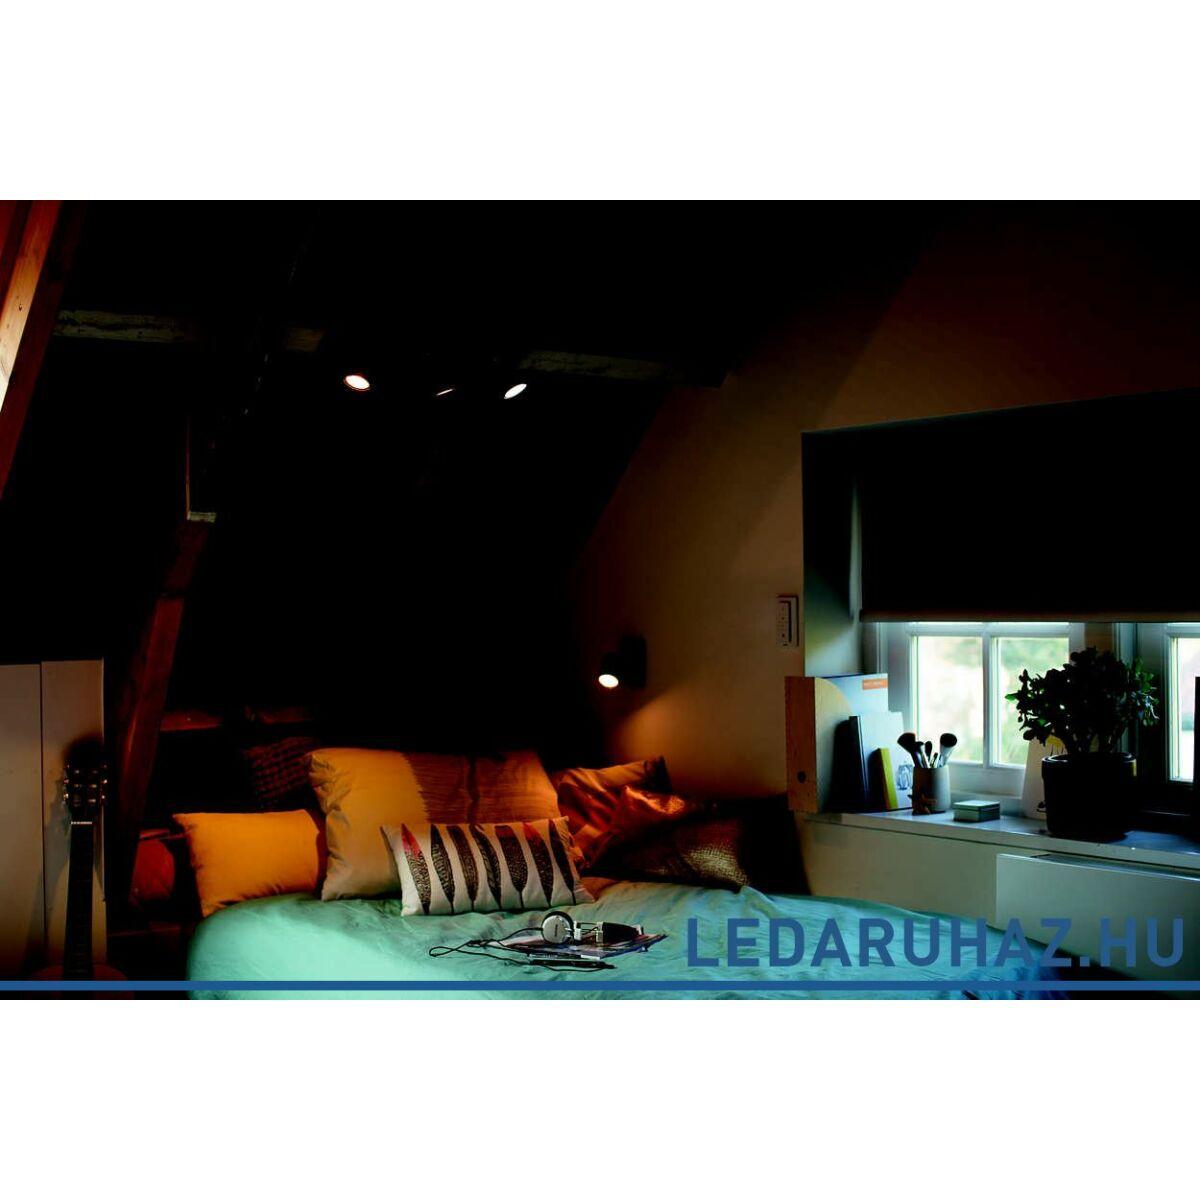 philips hue runner h rmas mennyezeti fekete led spot 2200k 6500k 3xgu10 dimswitch 53093 30 p7. Black Bedroom Furniture Sets. Home Design Ideas